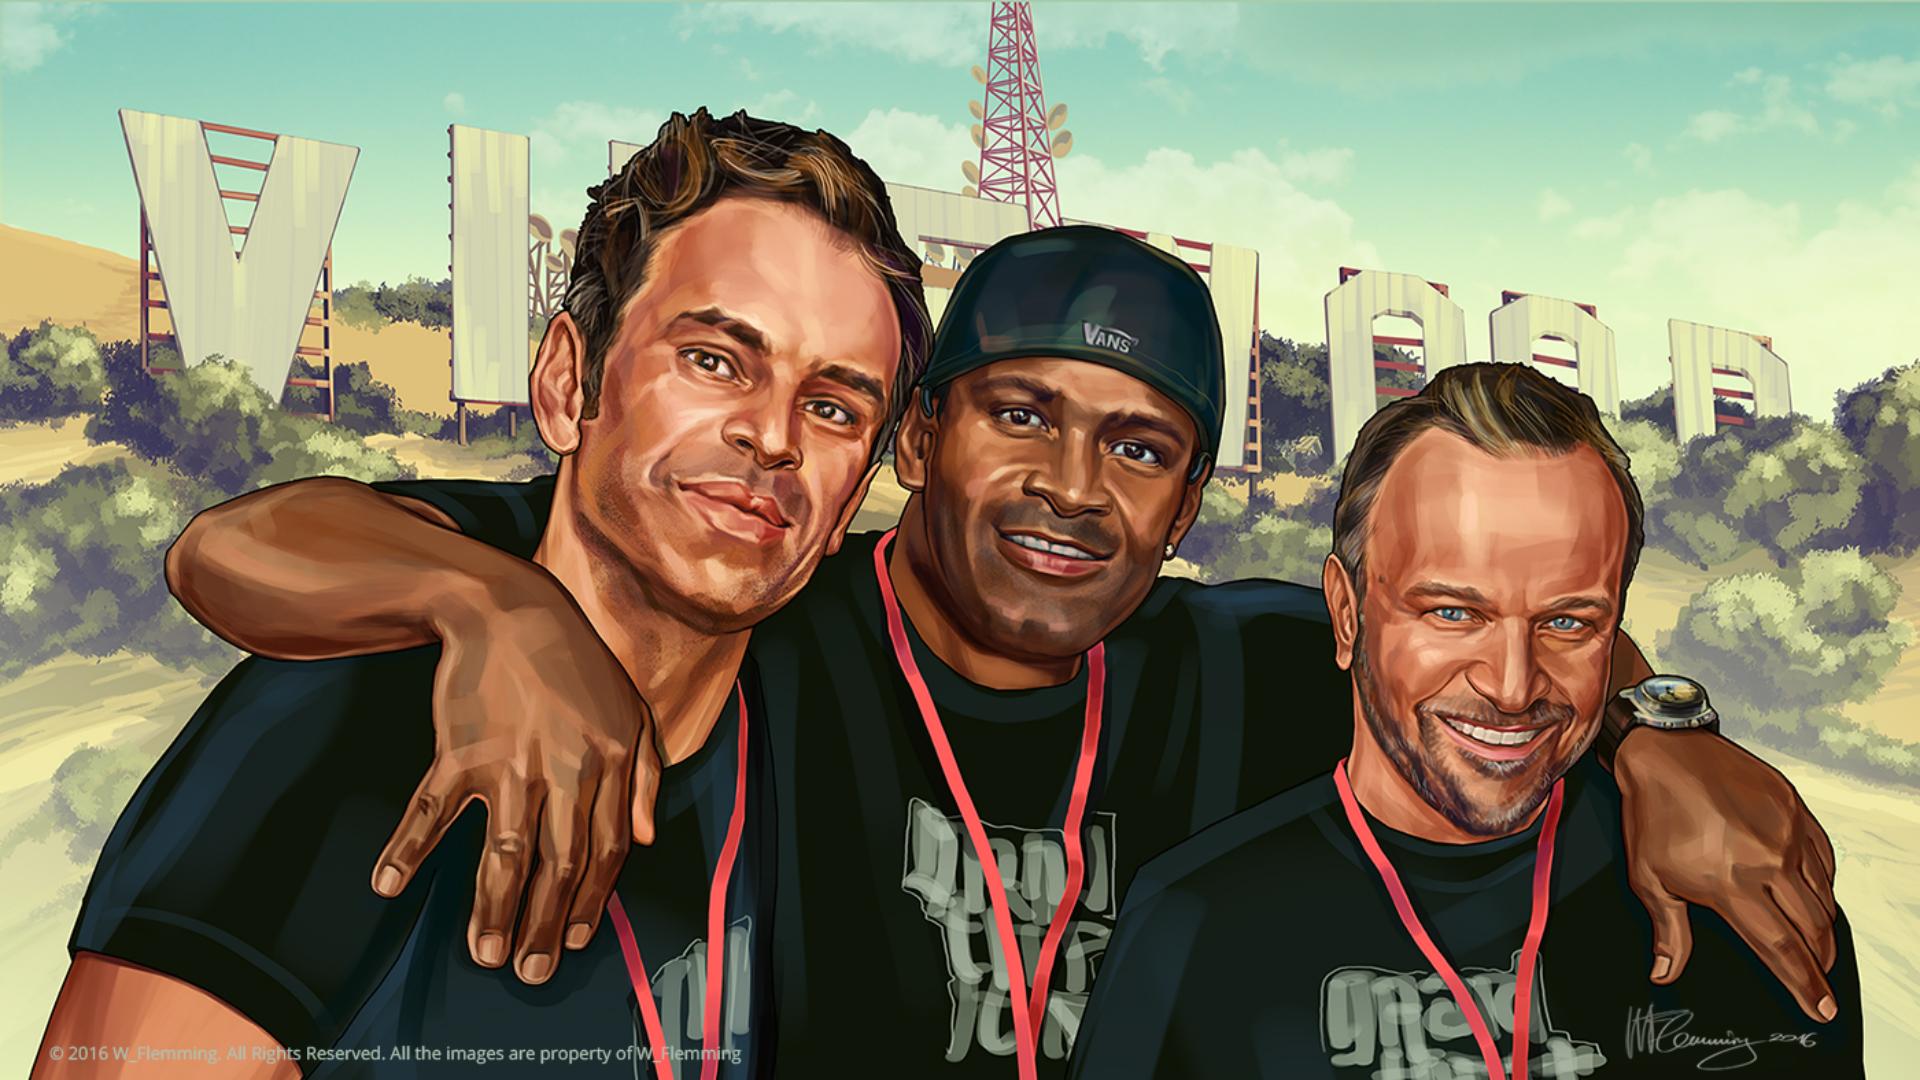 Wallpaper Gta5 Grand Theft Auto Grand Theft Auto V Trevor